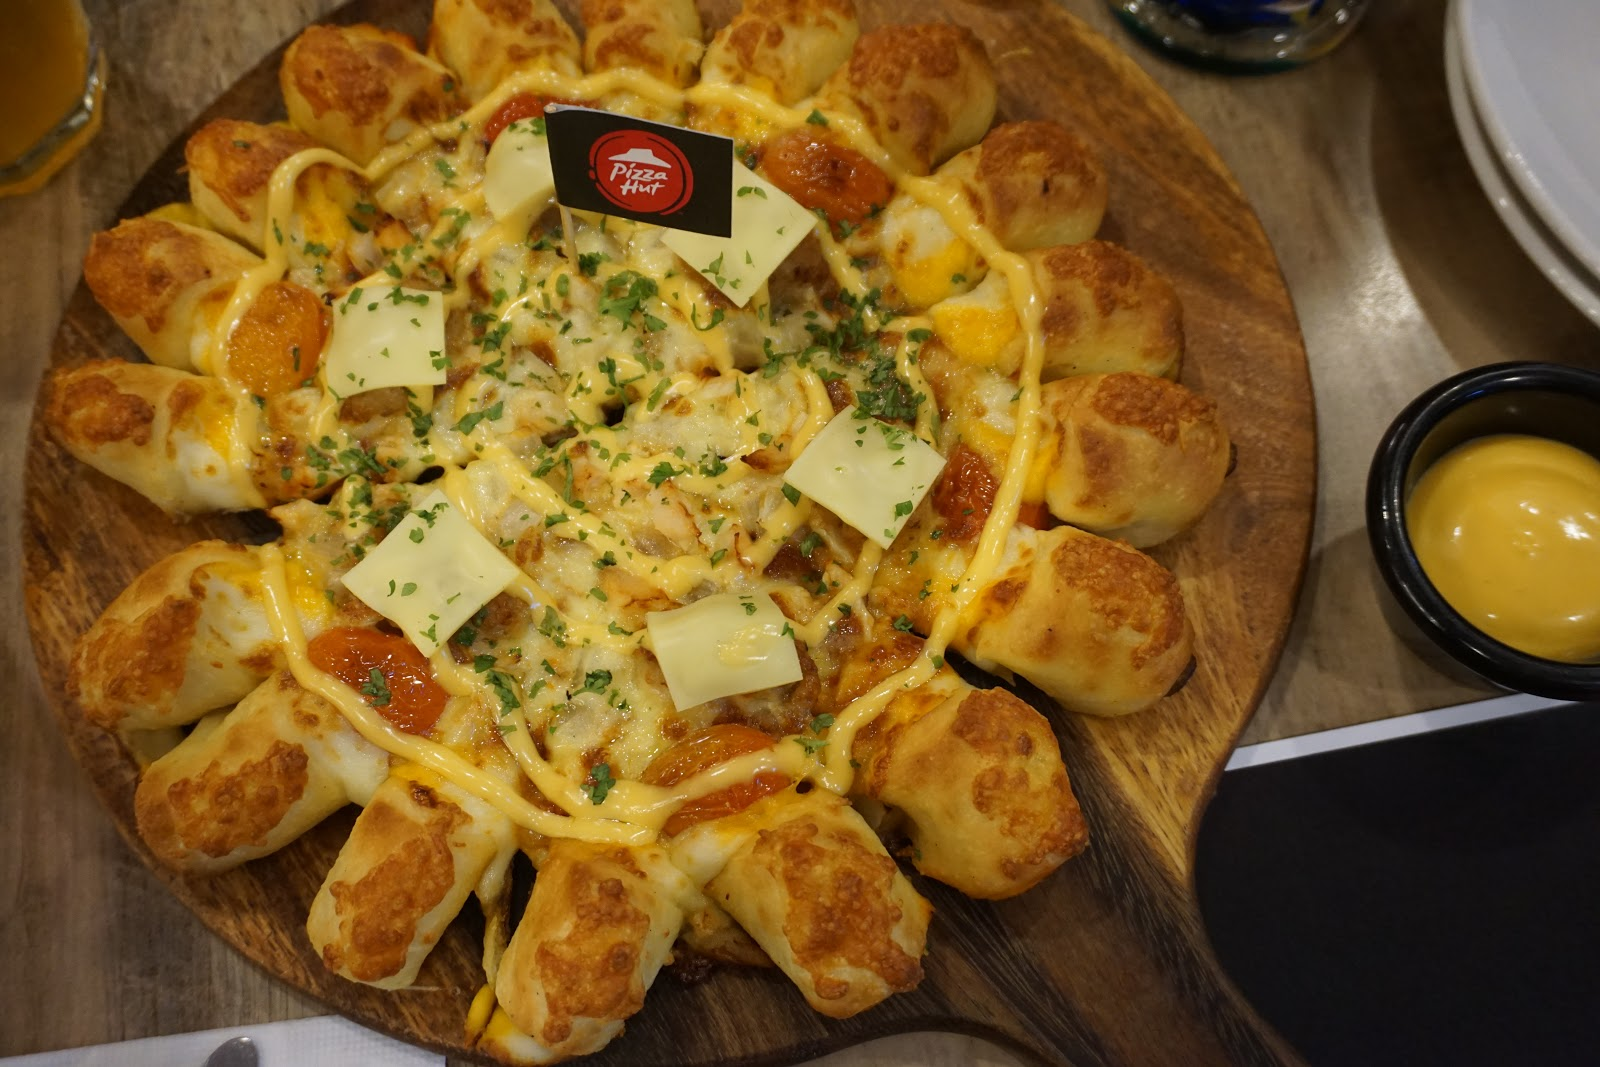 PIZZA HUT MALAYSIA KEMBALI DENGAN PIZA CHICKEN CHEESY BITES BARU #PIZZAHUTSIAPAKENA